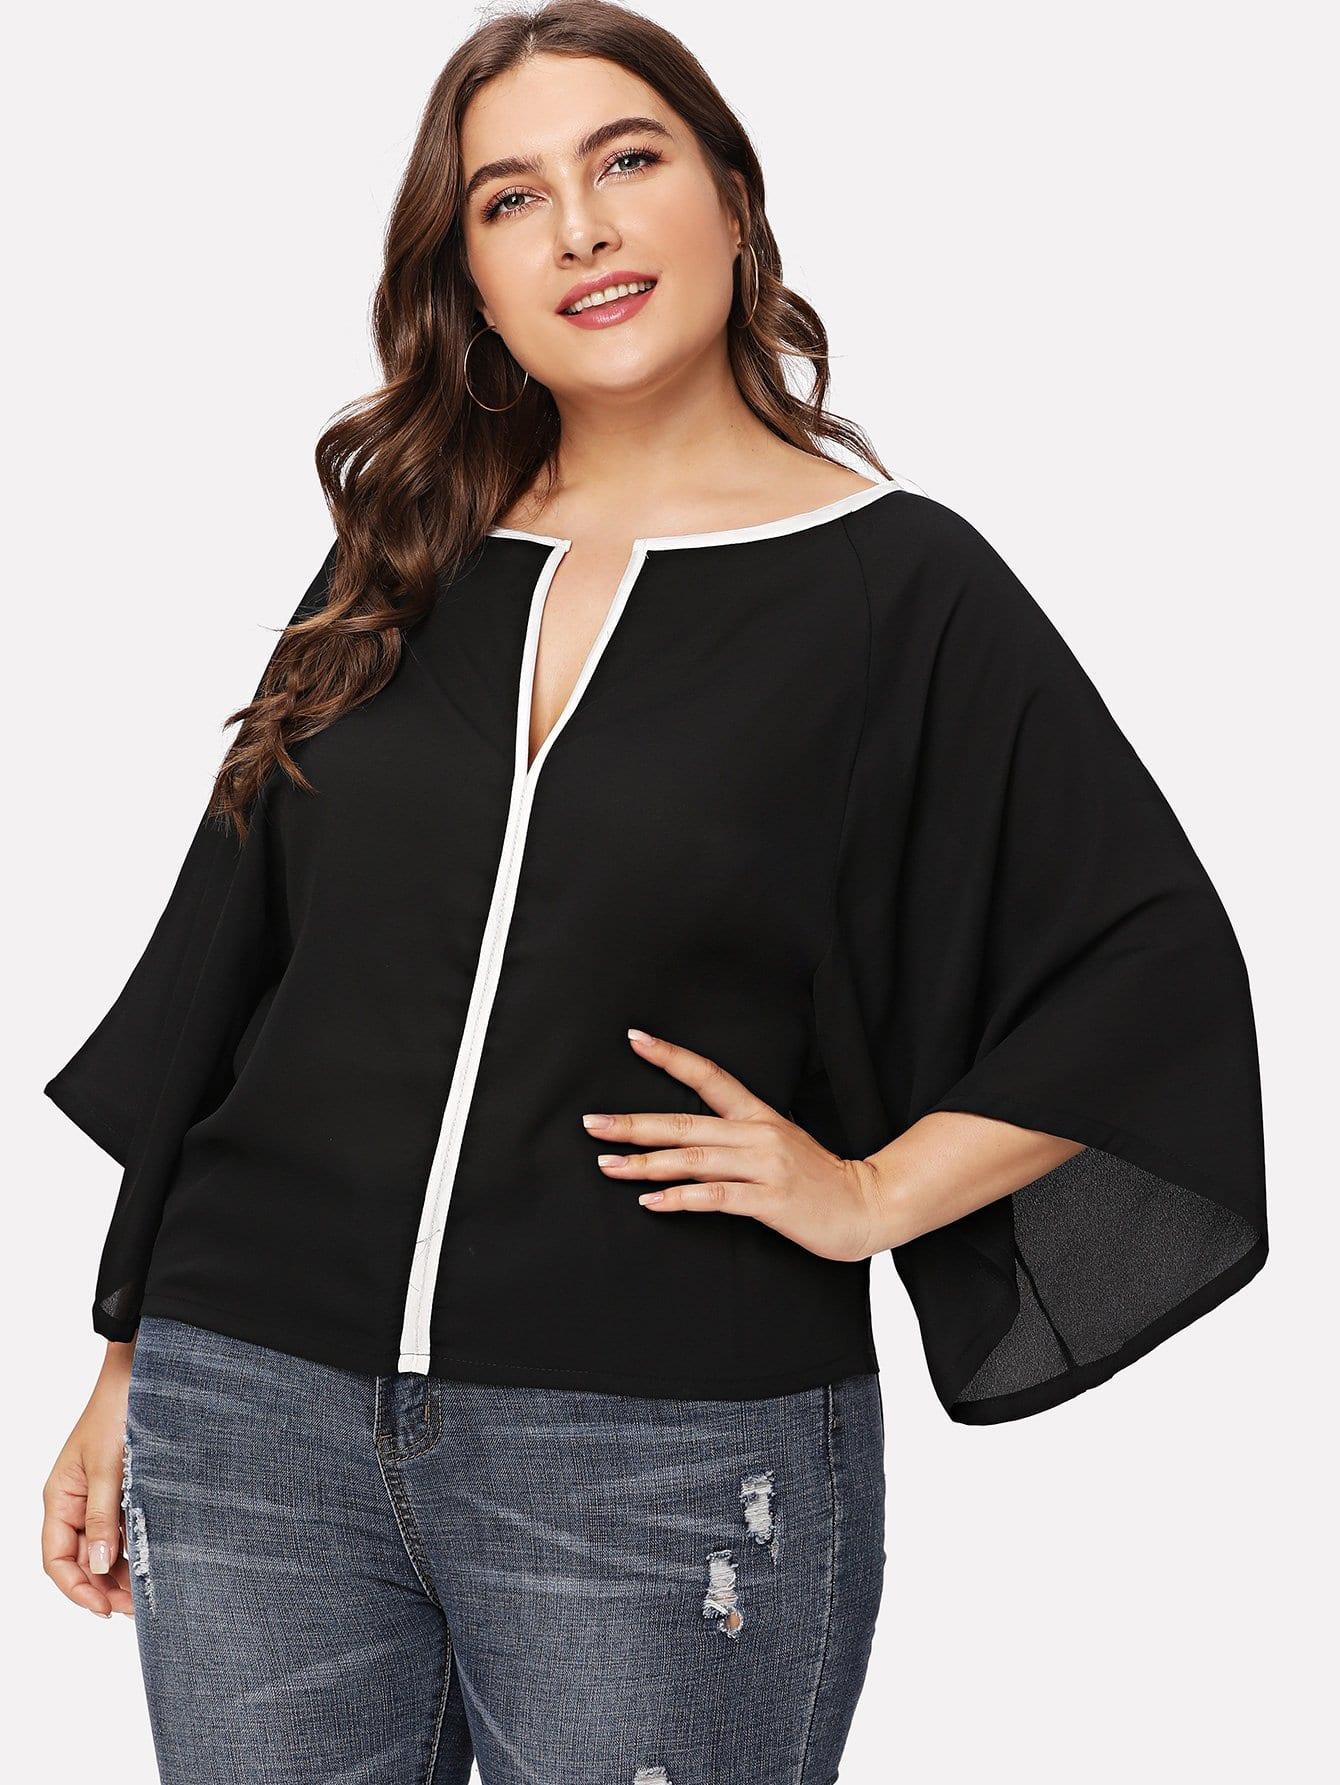 Plus Contrast Trim V Neckline Blouse contrast striped v neckline flute sleeve blouse